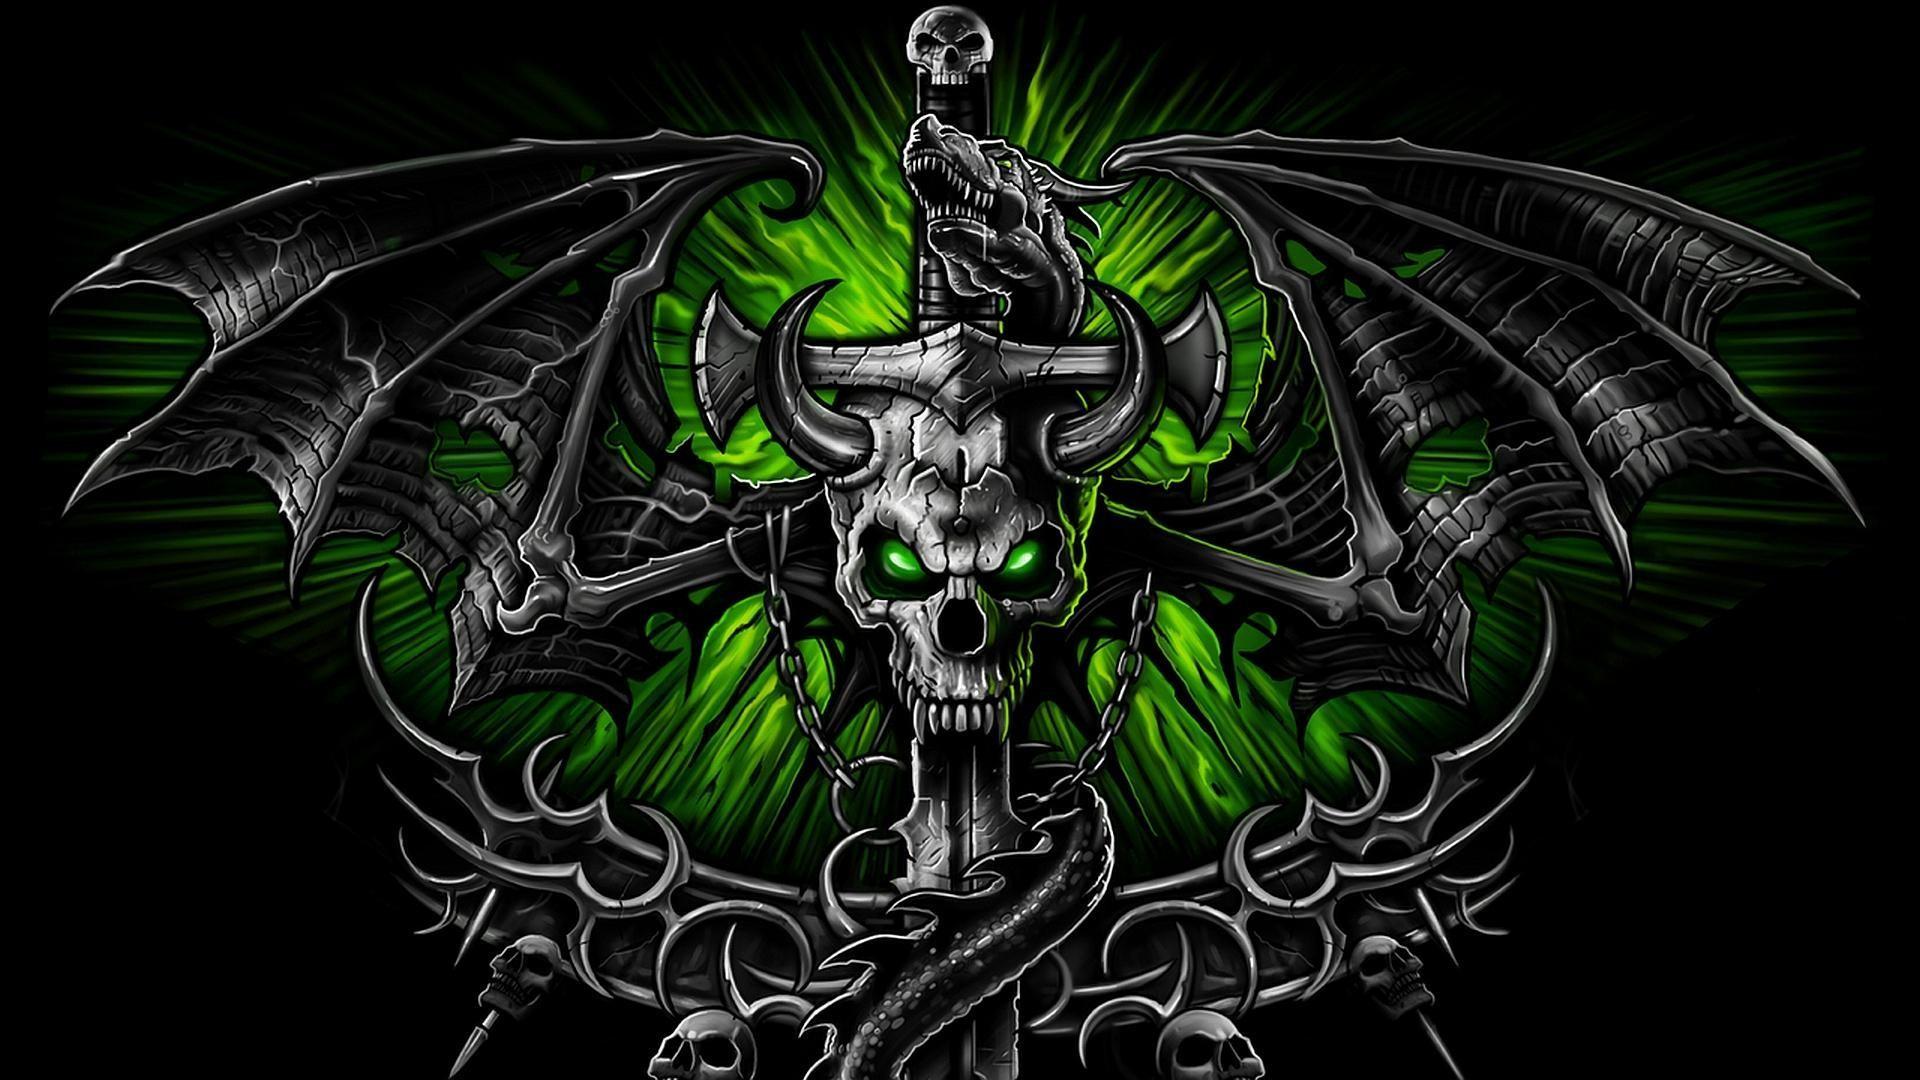 Skulls wallpaper download free awesome high resolution - Skeleton wallpaper ...